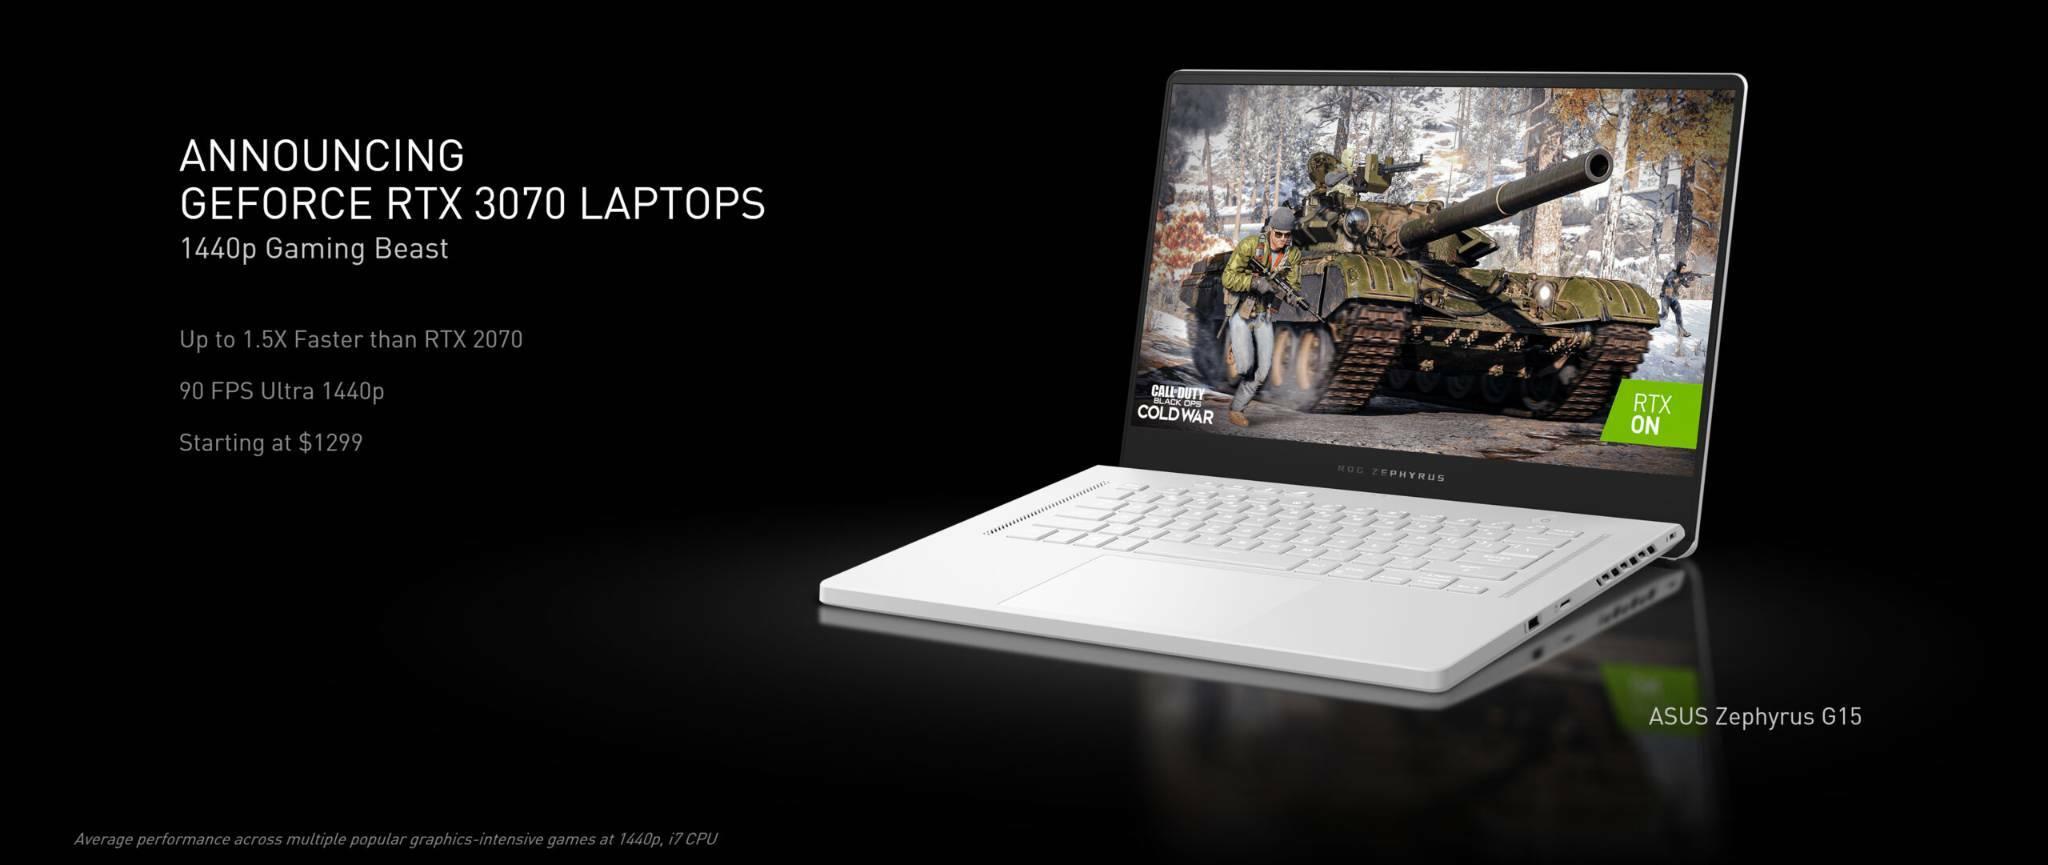 NVIDIA GeForce RTX 3070 Mobile